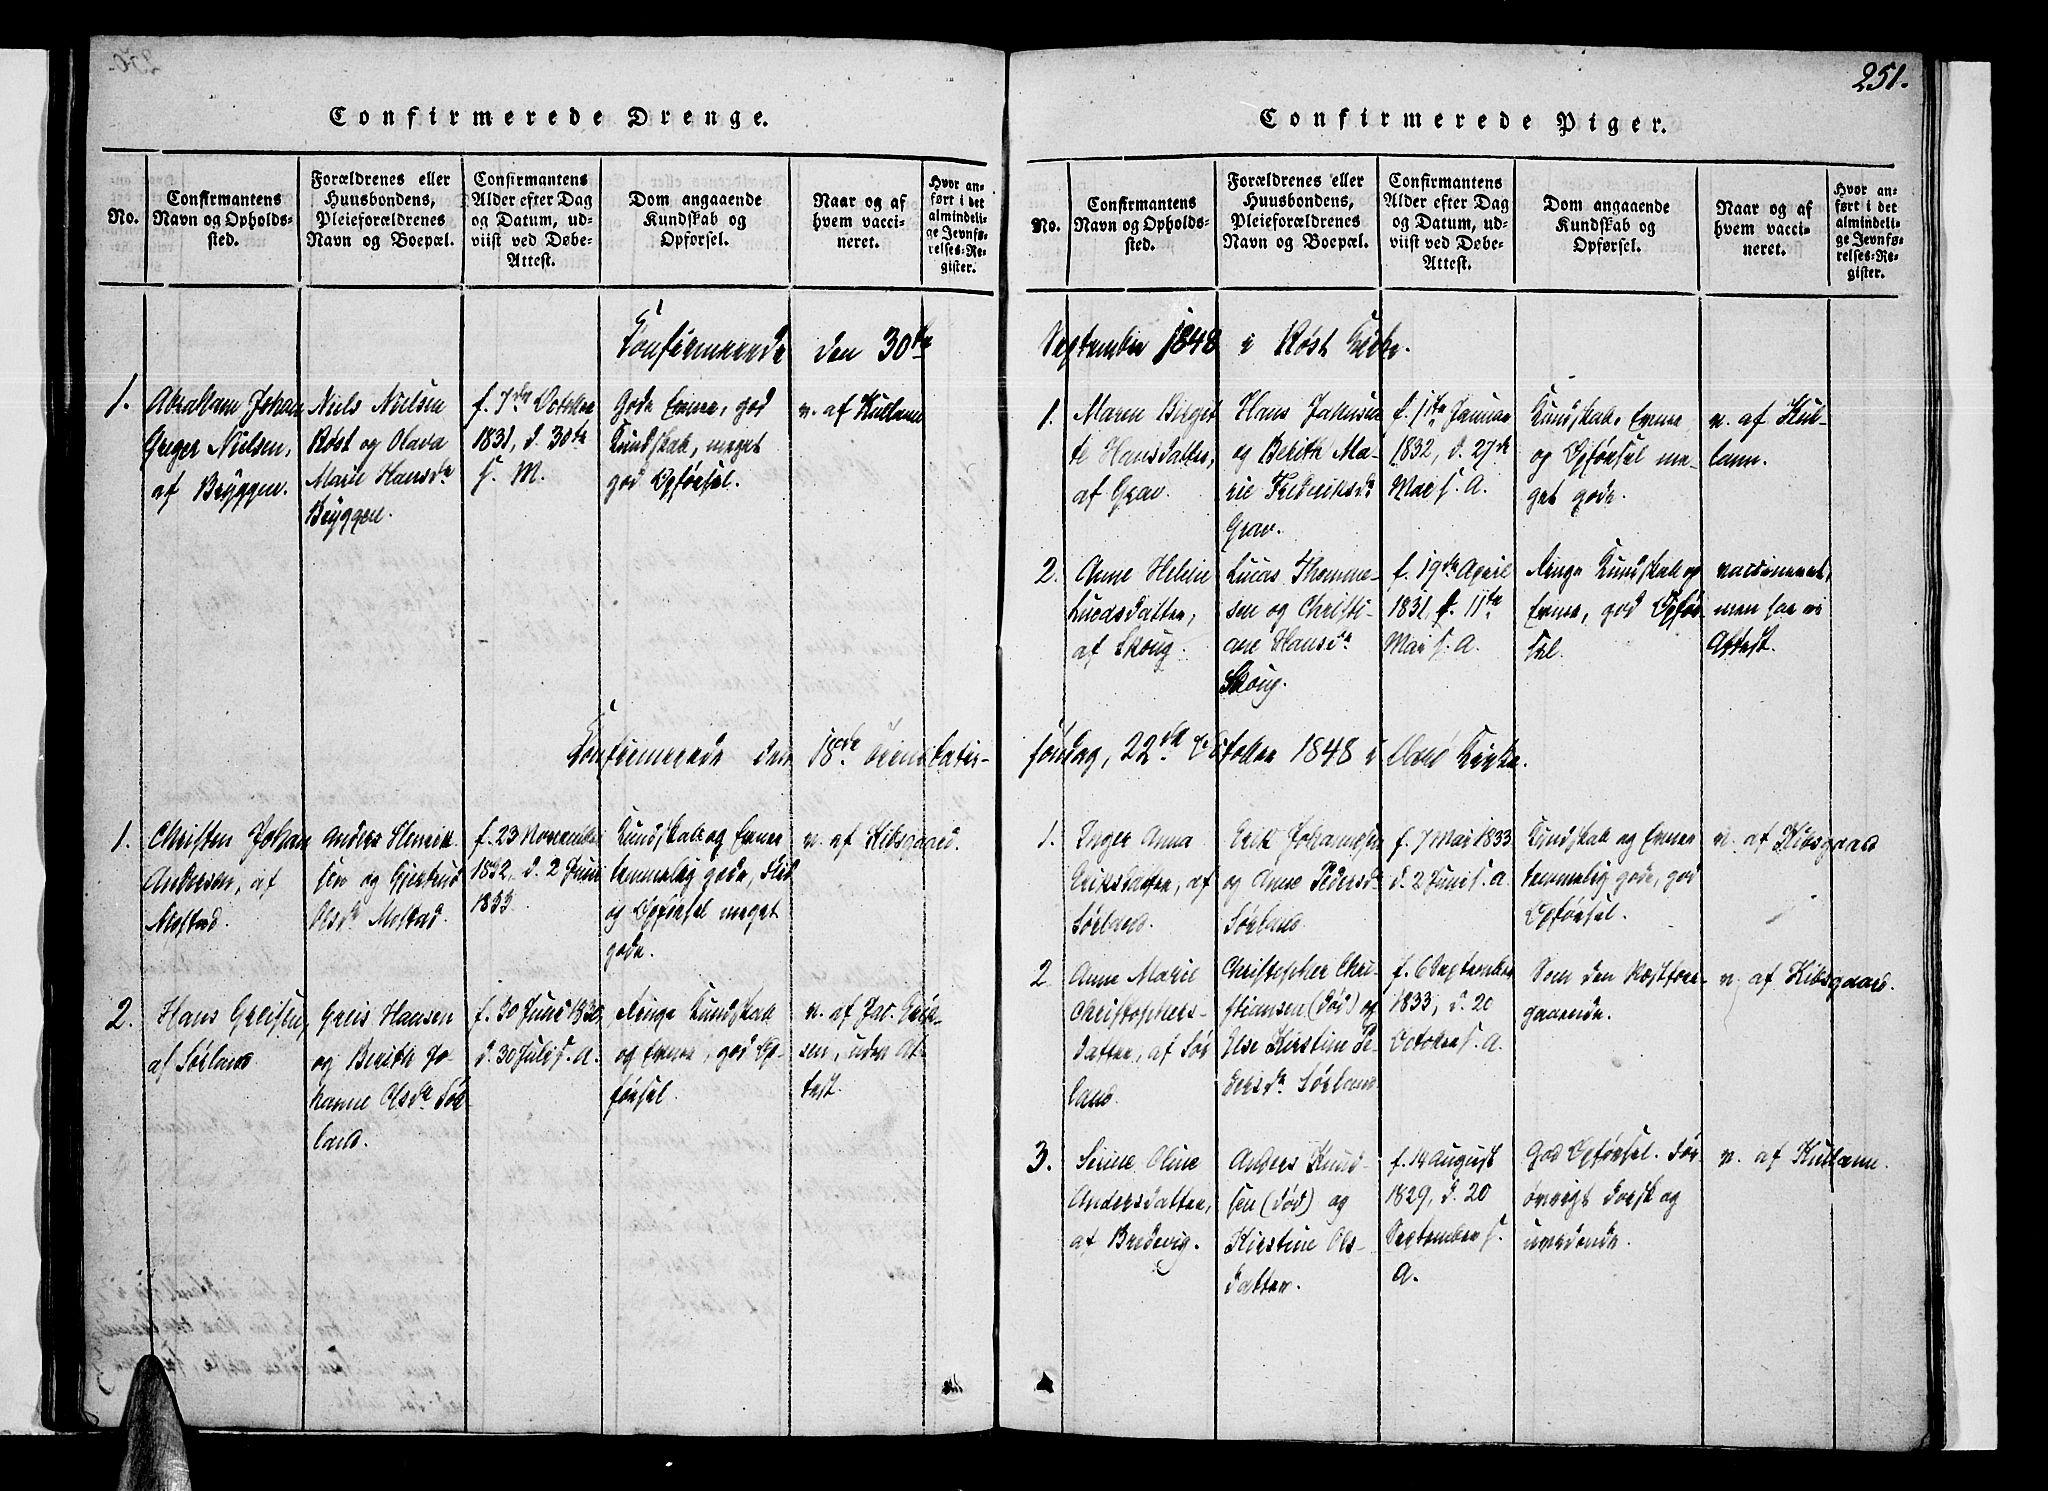 SAT, Ministerialprotokoller, klokkerbøker og fødselsregistre - Nordland, 807/L0120: Ministerialbok nr. 807A03, 1821-1848, s. 251